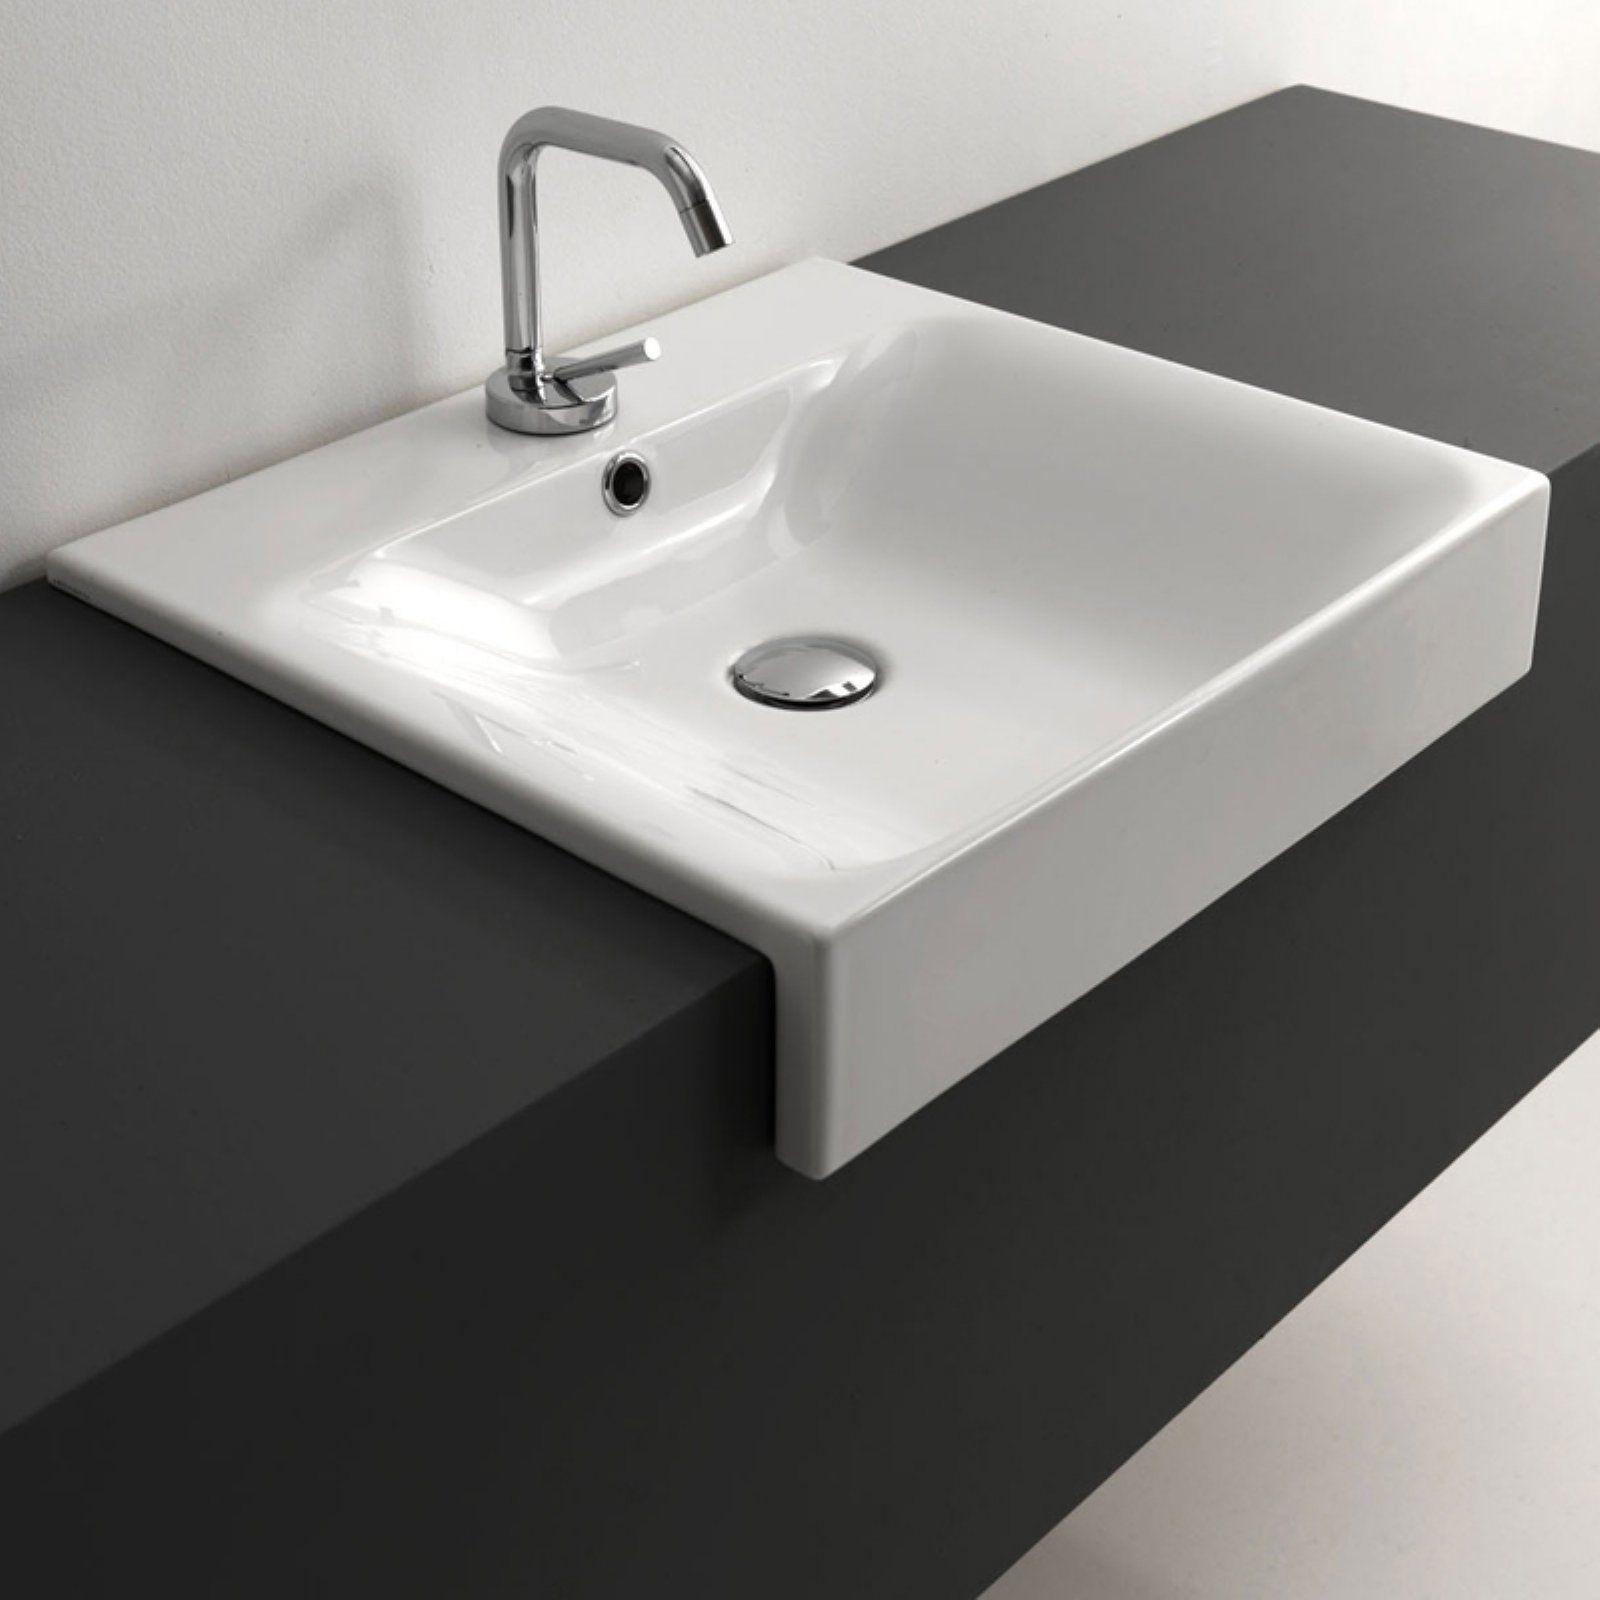 Ws Bath Collections Cento 3546 Semi Recessed Bathroom Sink Bathroom Sink Design Bathroom Sink